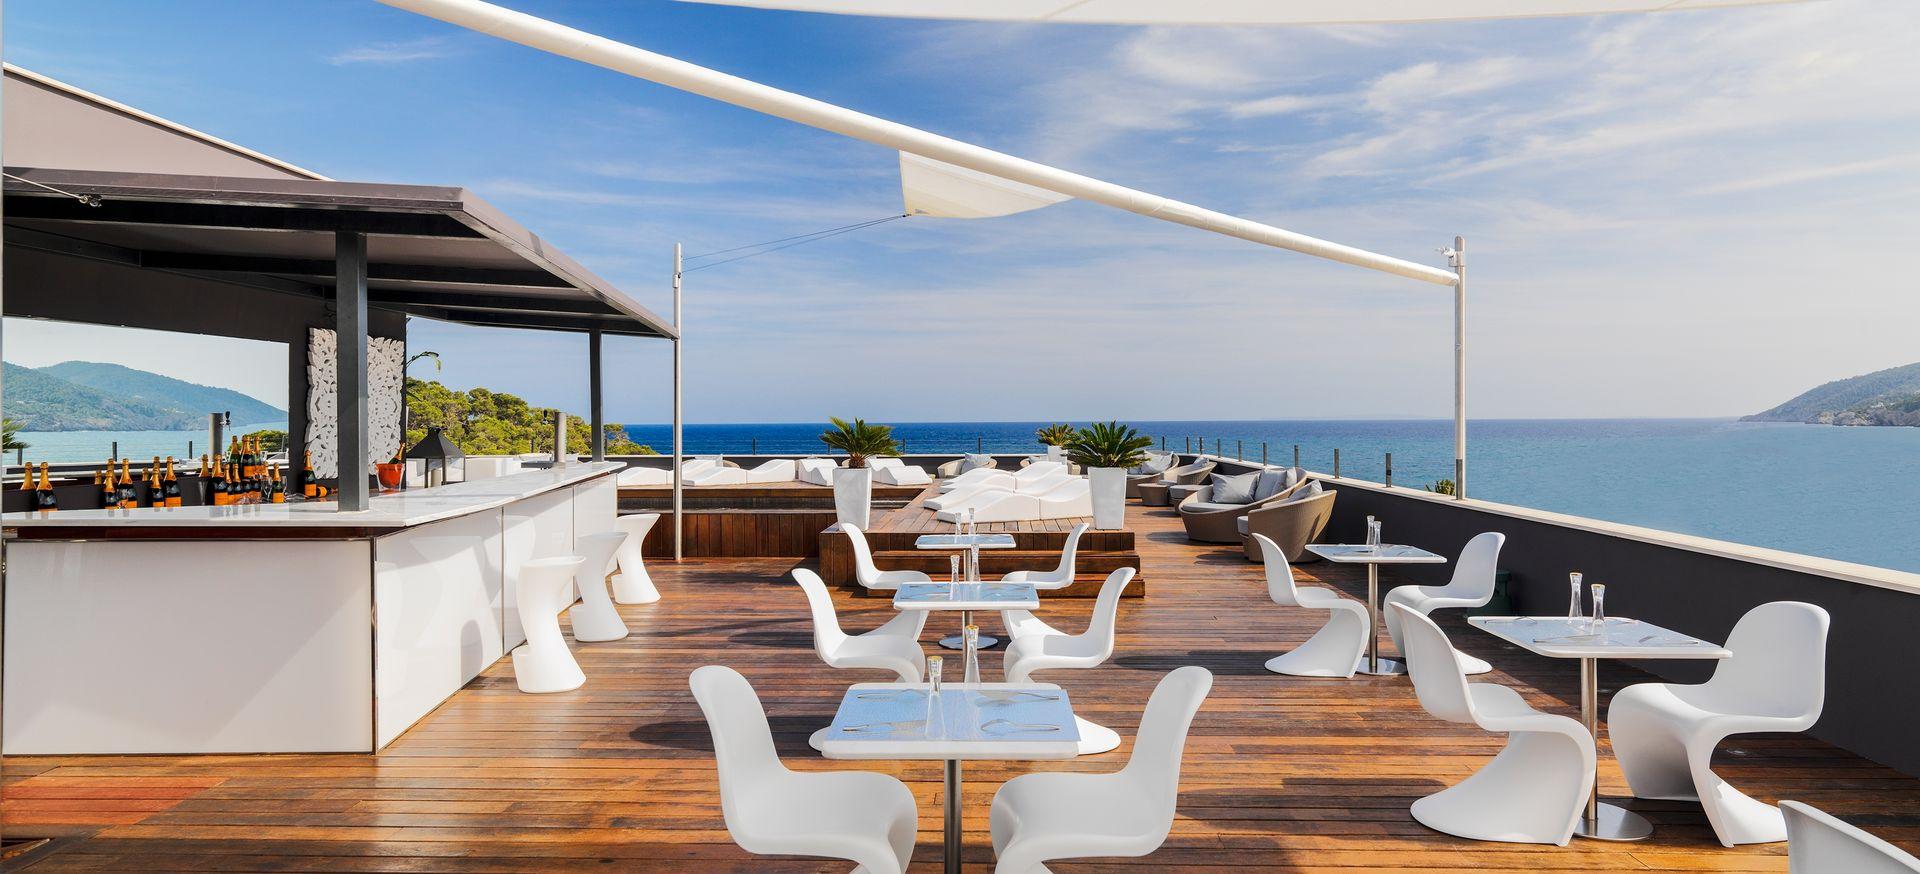 Hotel aguas de ibiza luxury hotel spain original travel for Ibiza hotel luxury 5 star